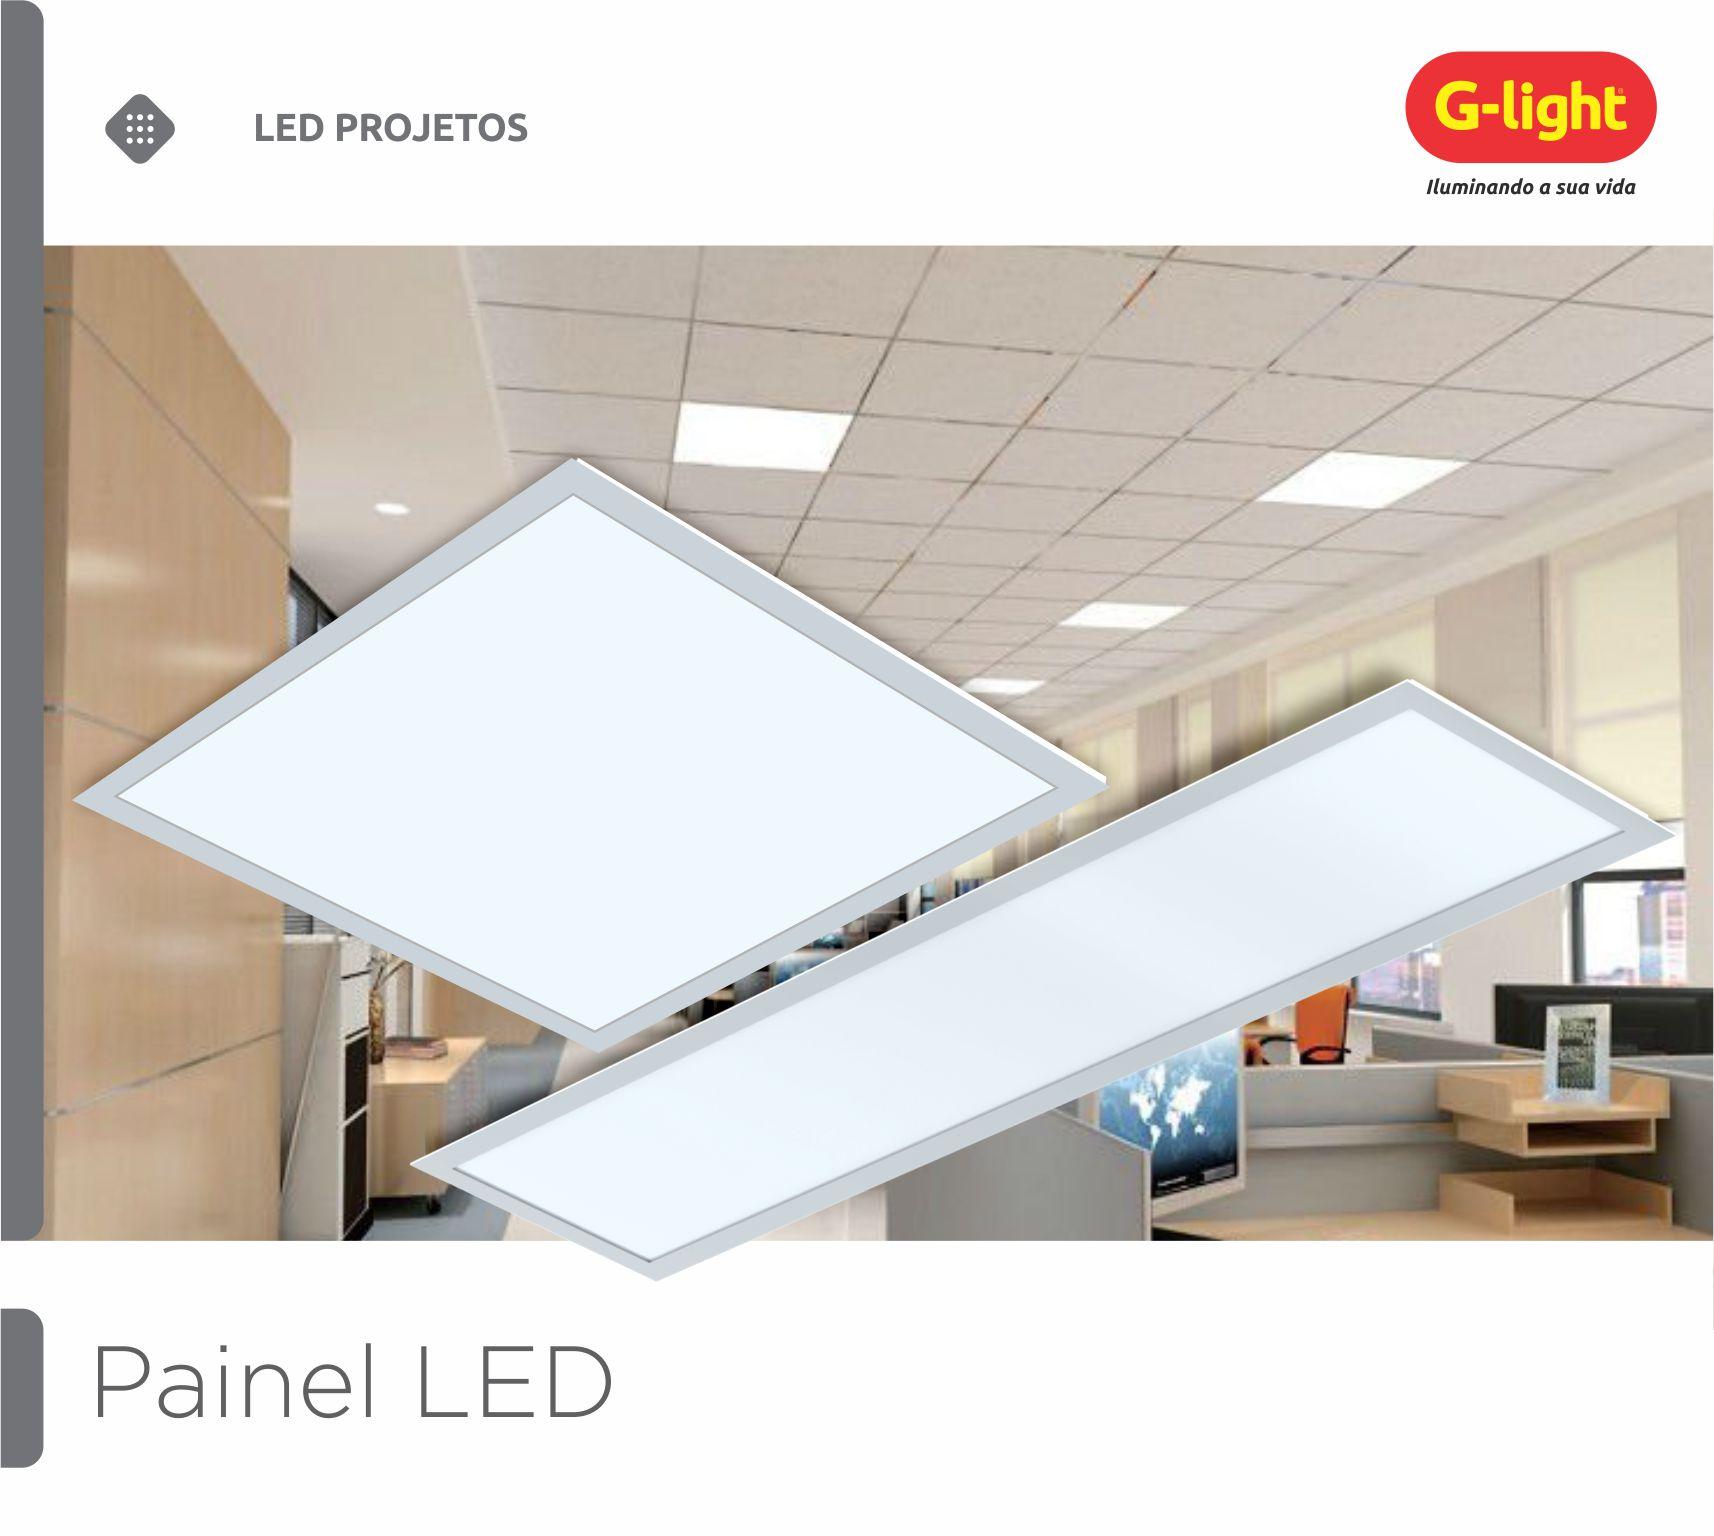 Painel SLIM LED